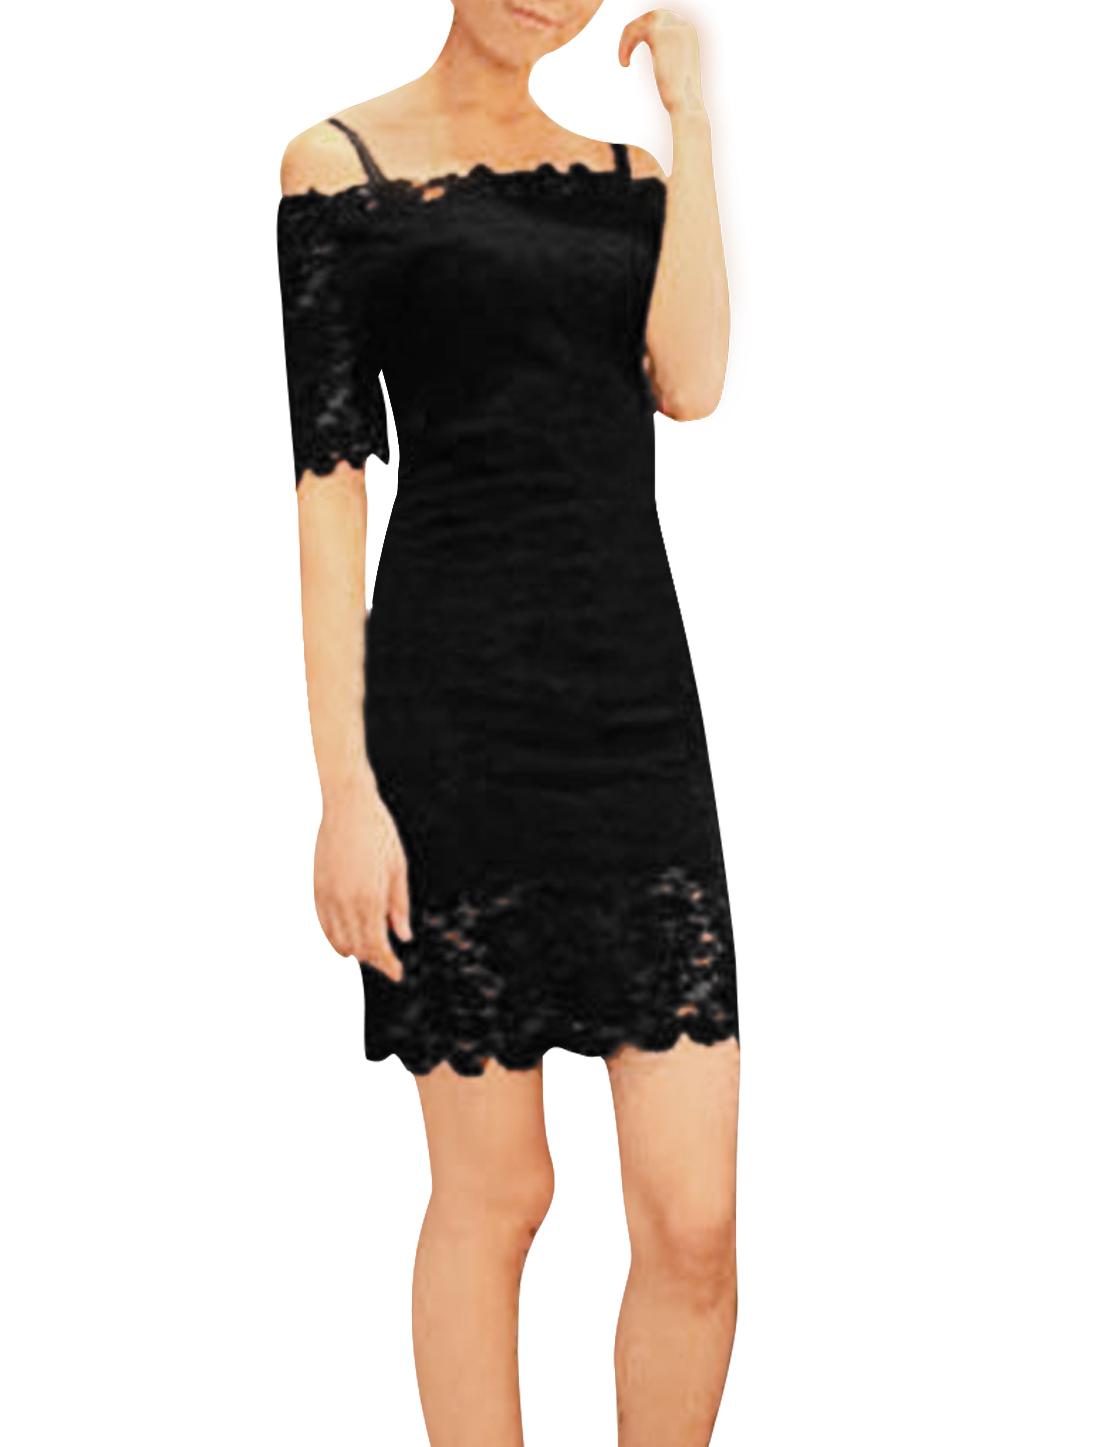 Ladies Adjustable Spaghetti Straps Design Black Lace Covered Mini Dress XS